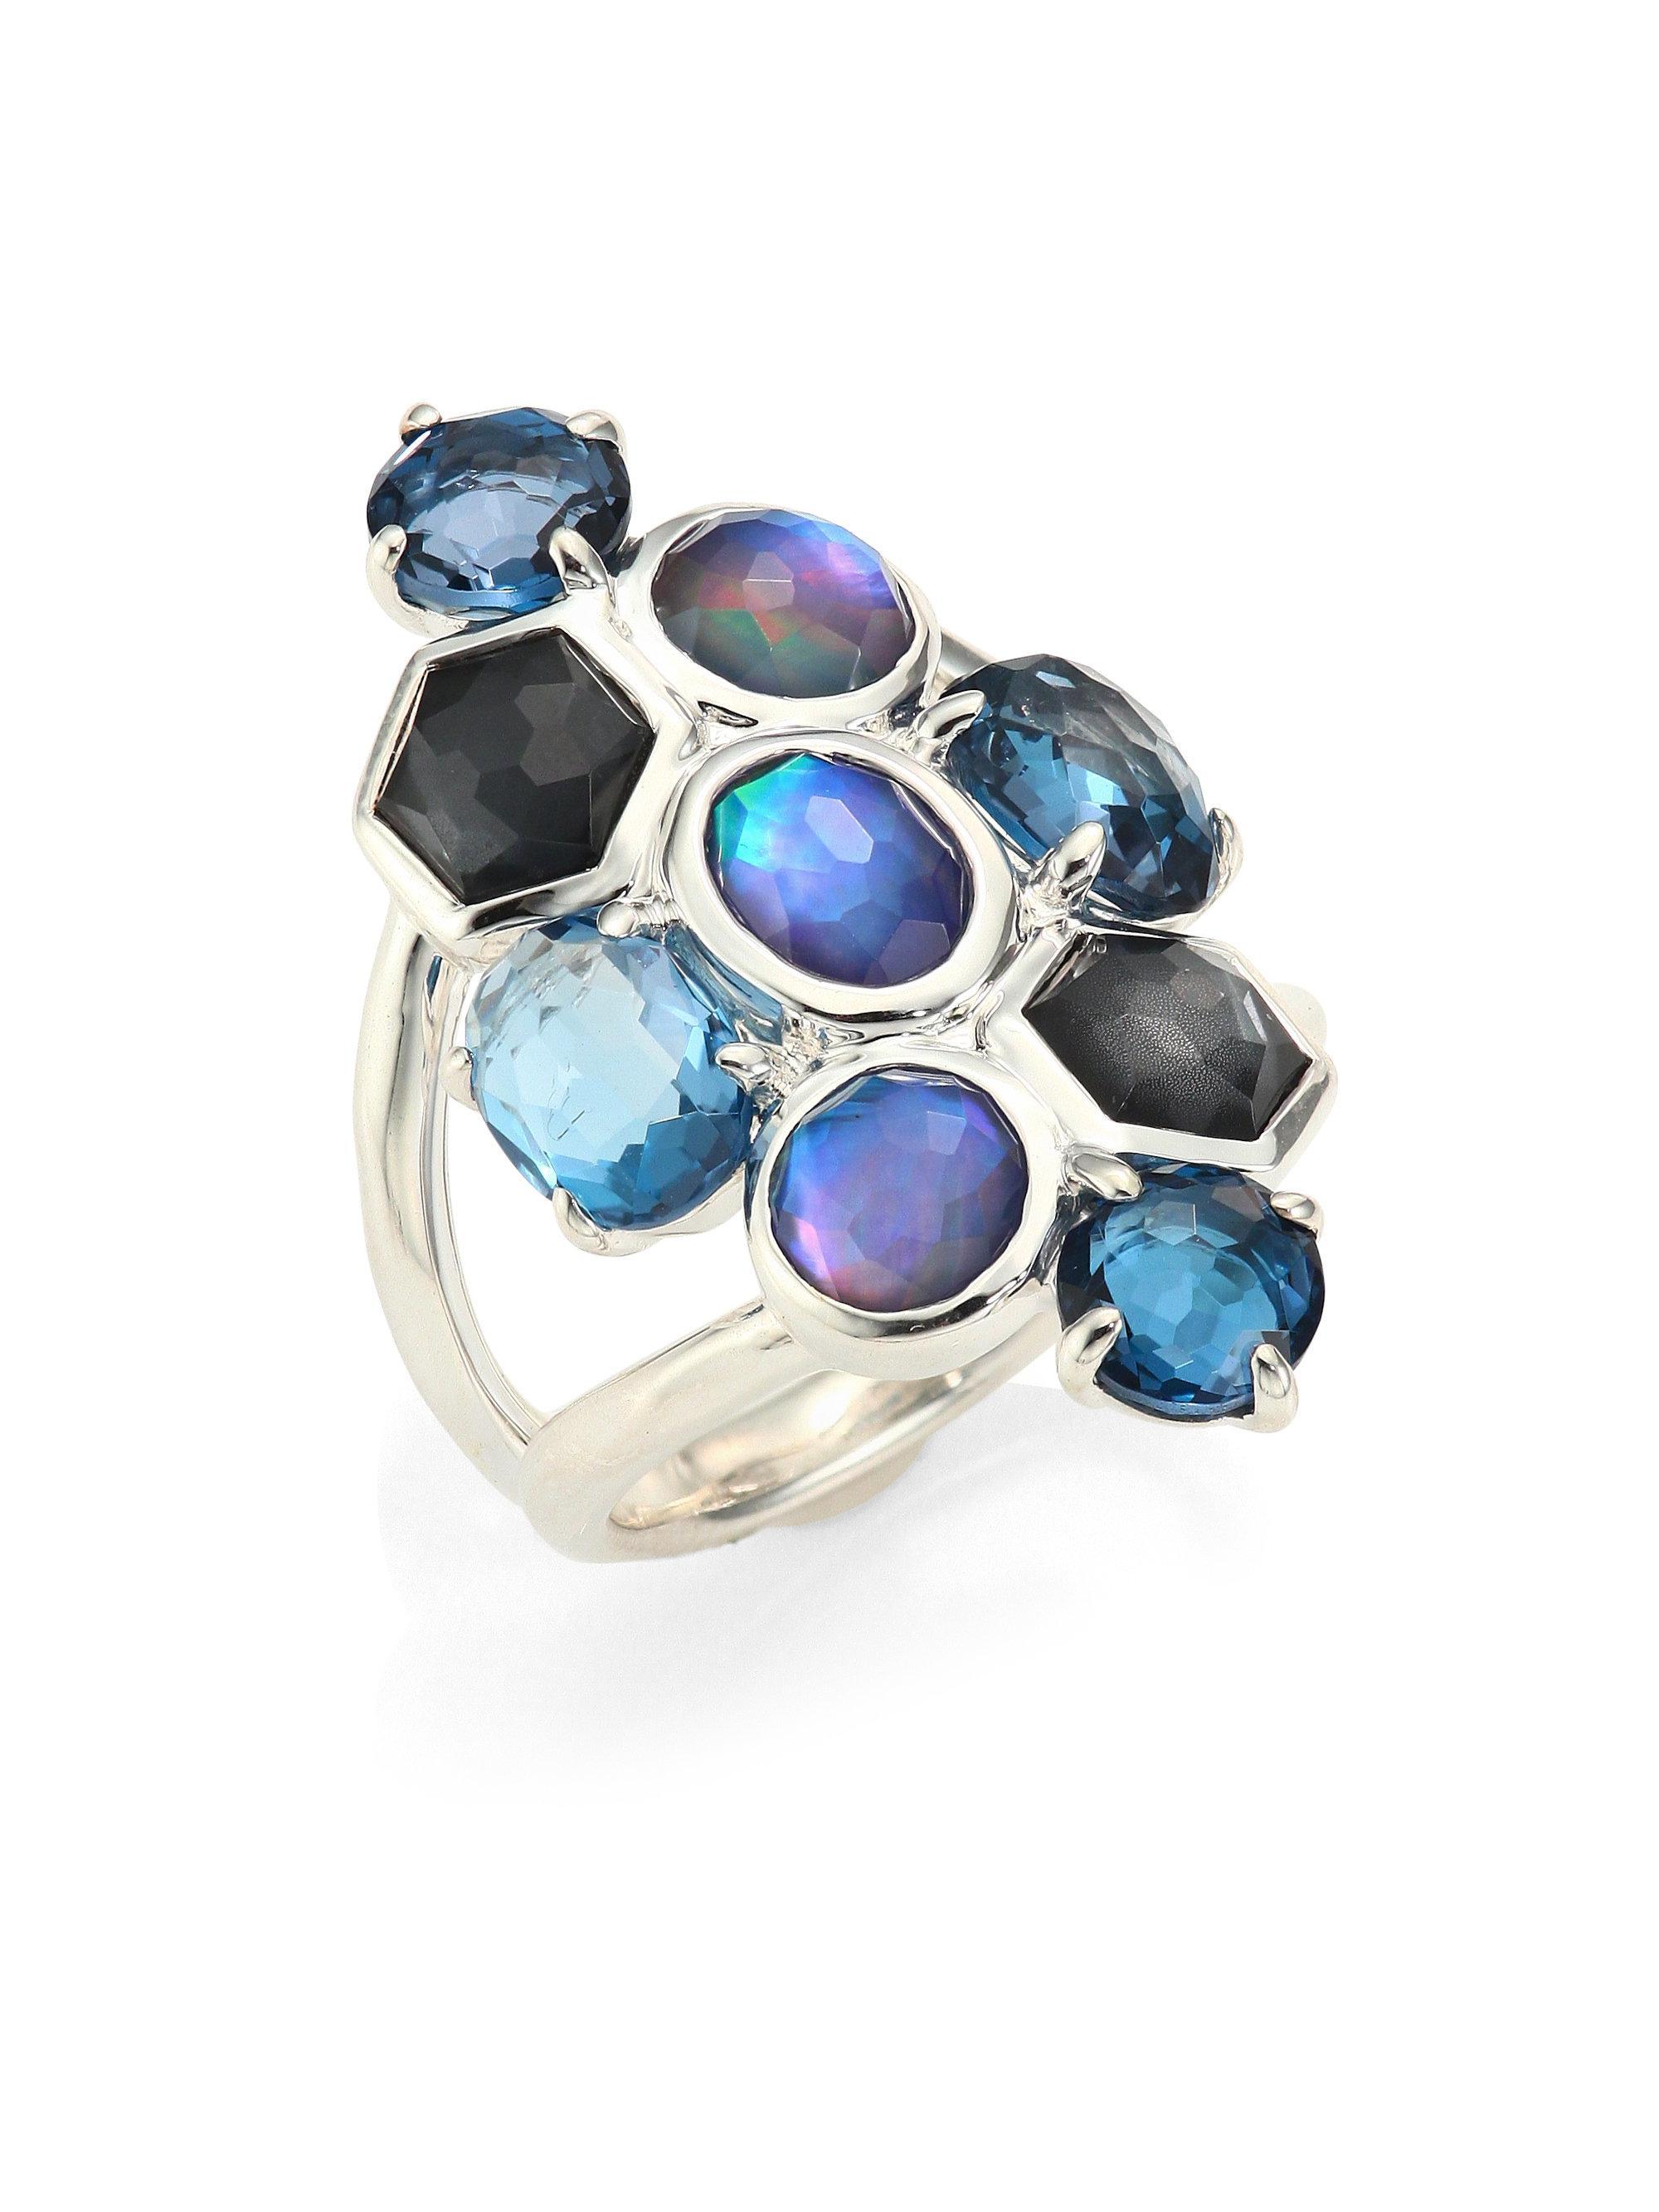 Ippolita 925 Rock Candy Six-Stone Open Ring in Eclipse UNc7d97cuM